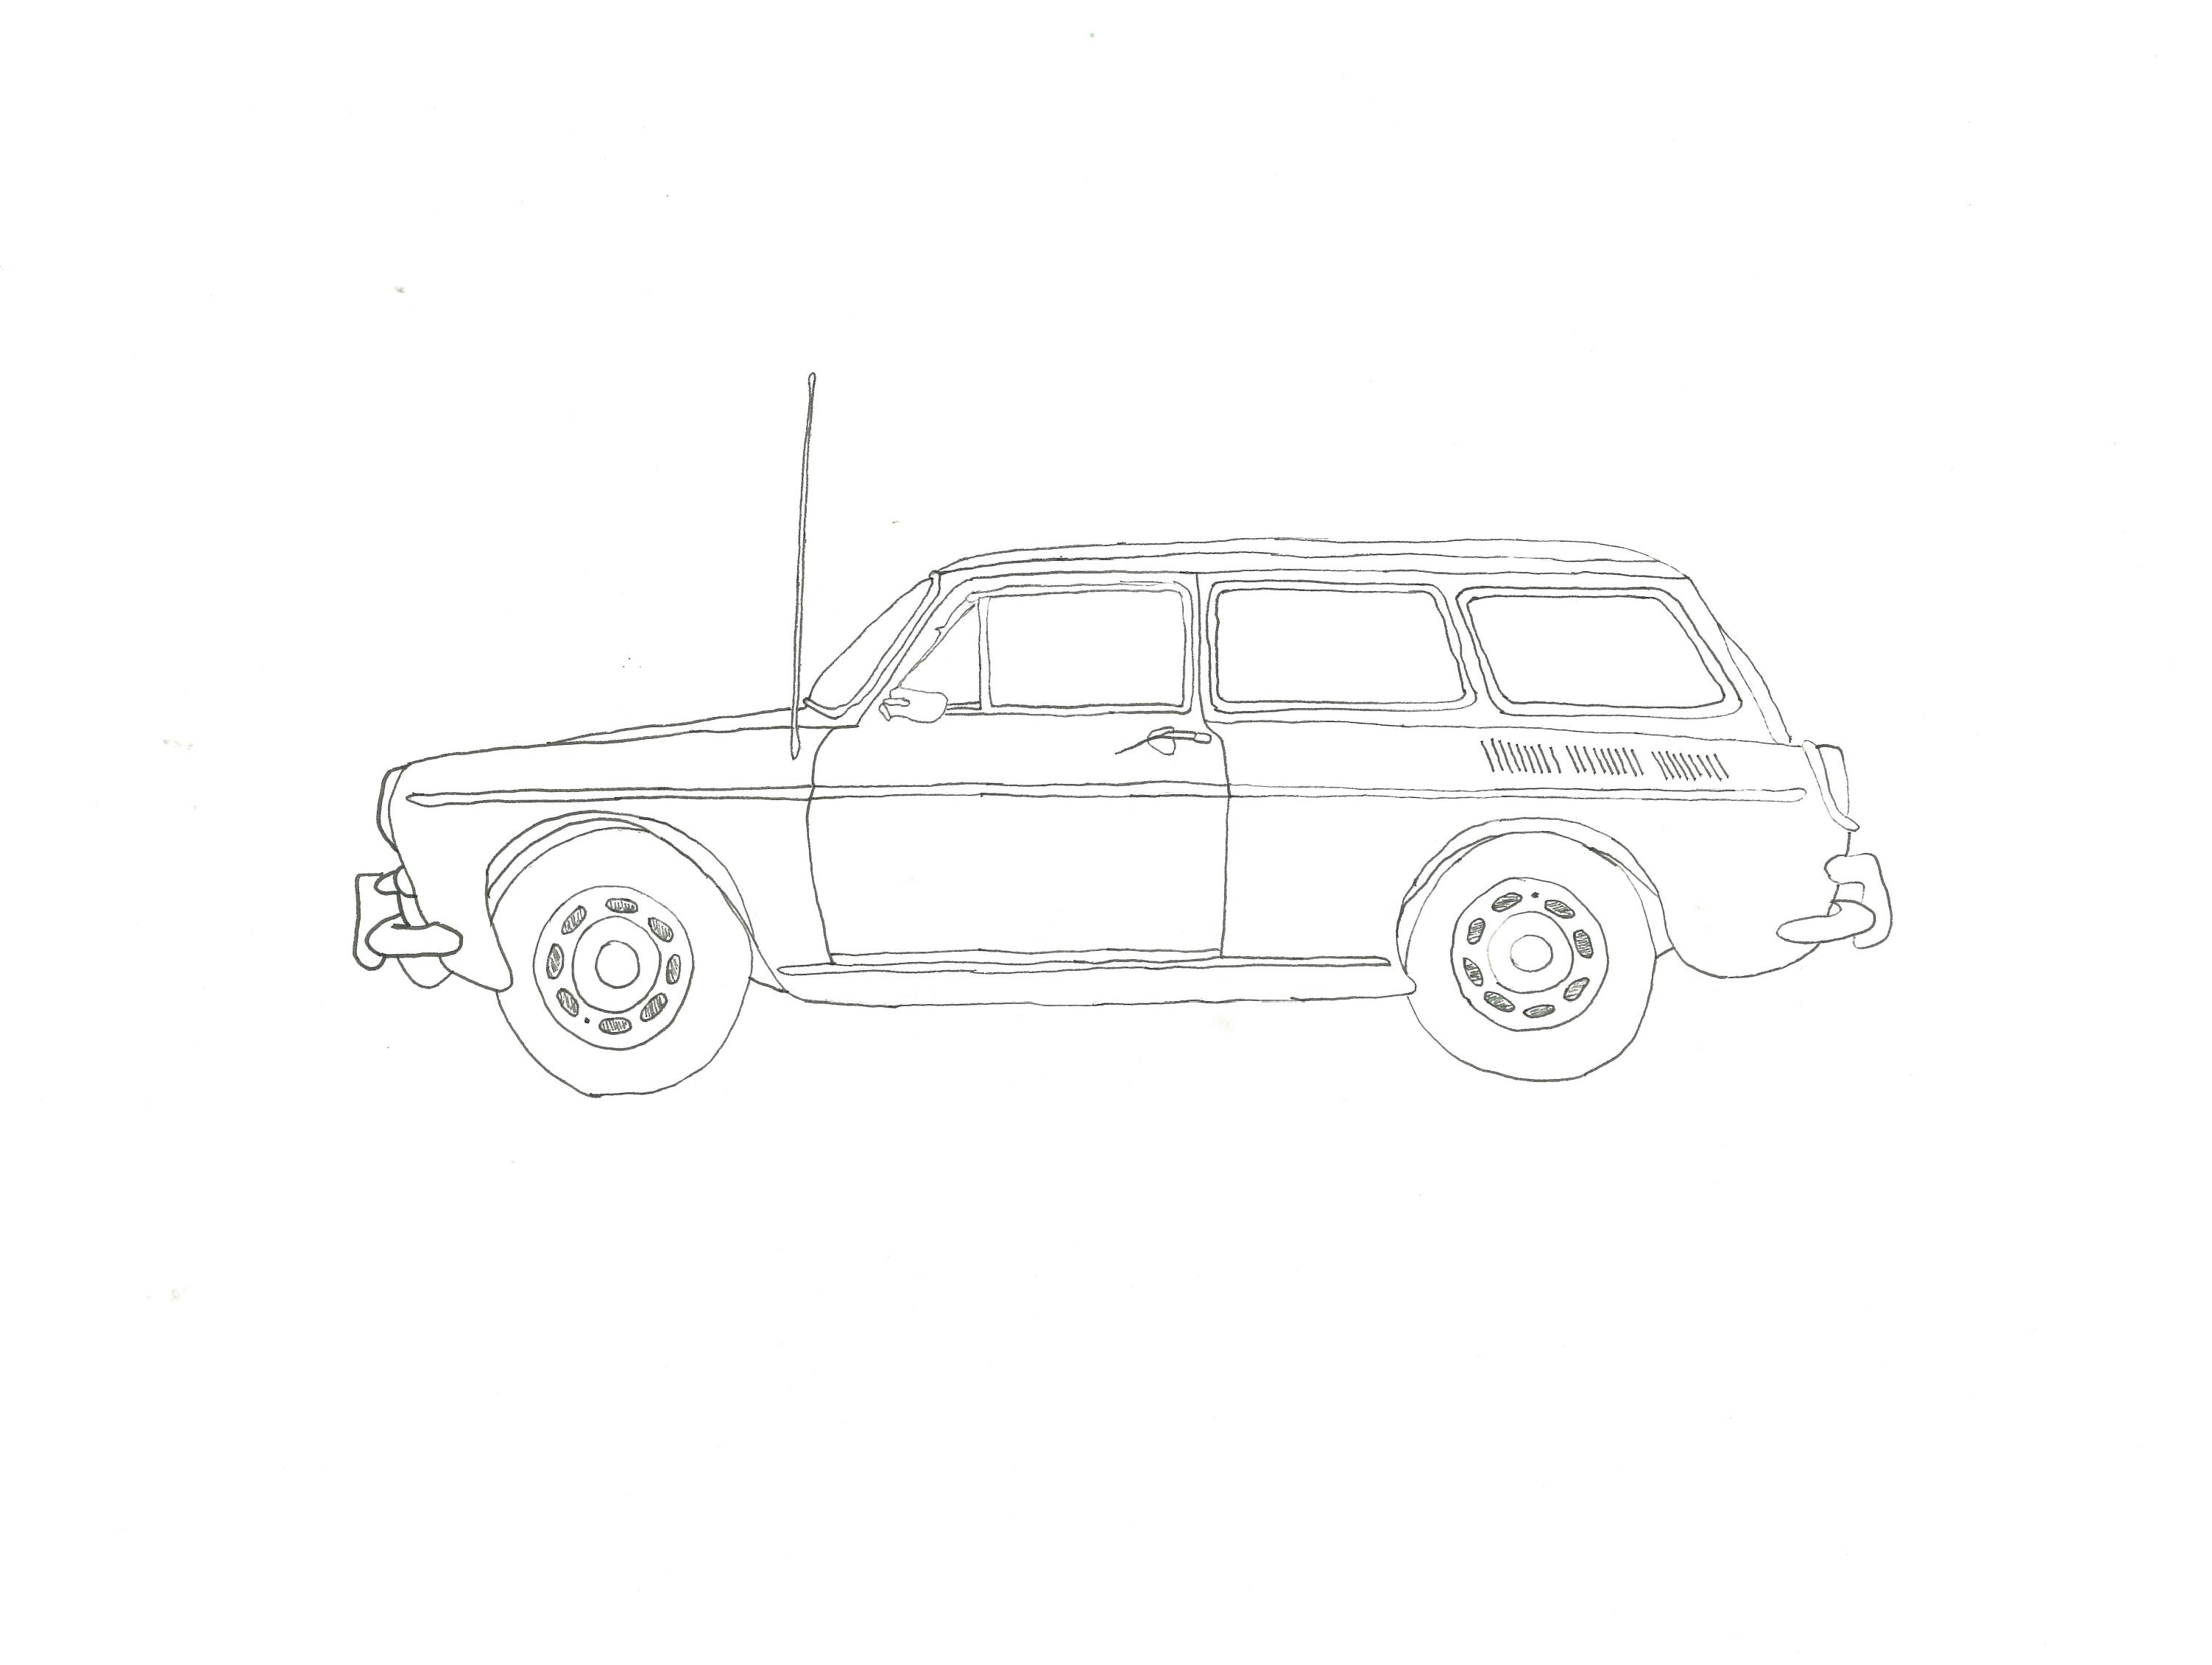 Squareback Wagon, Volkswagon '69